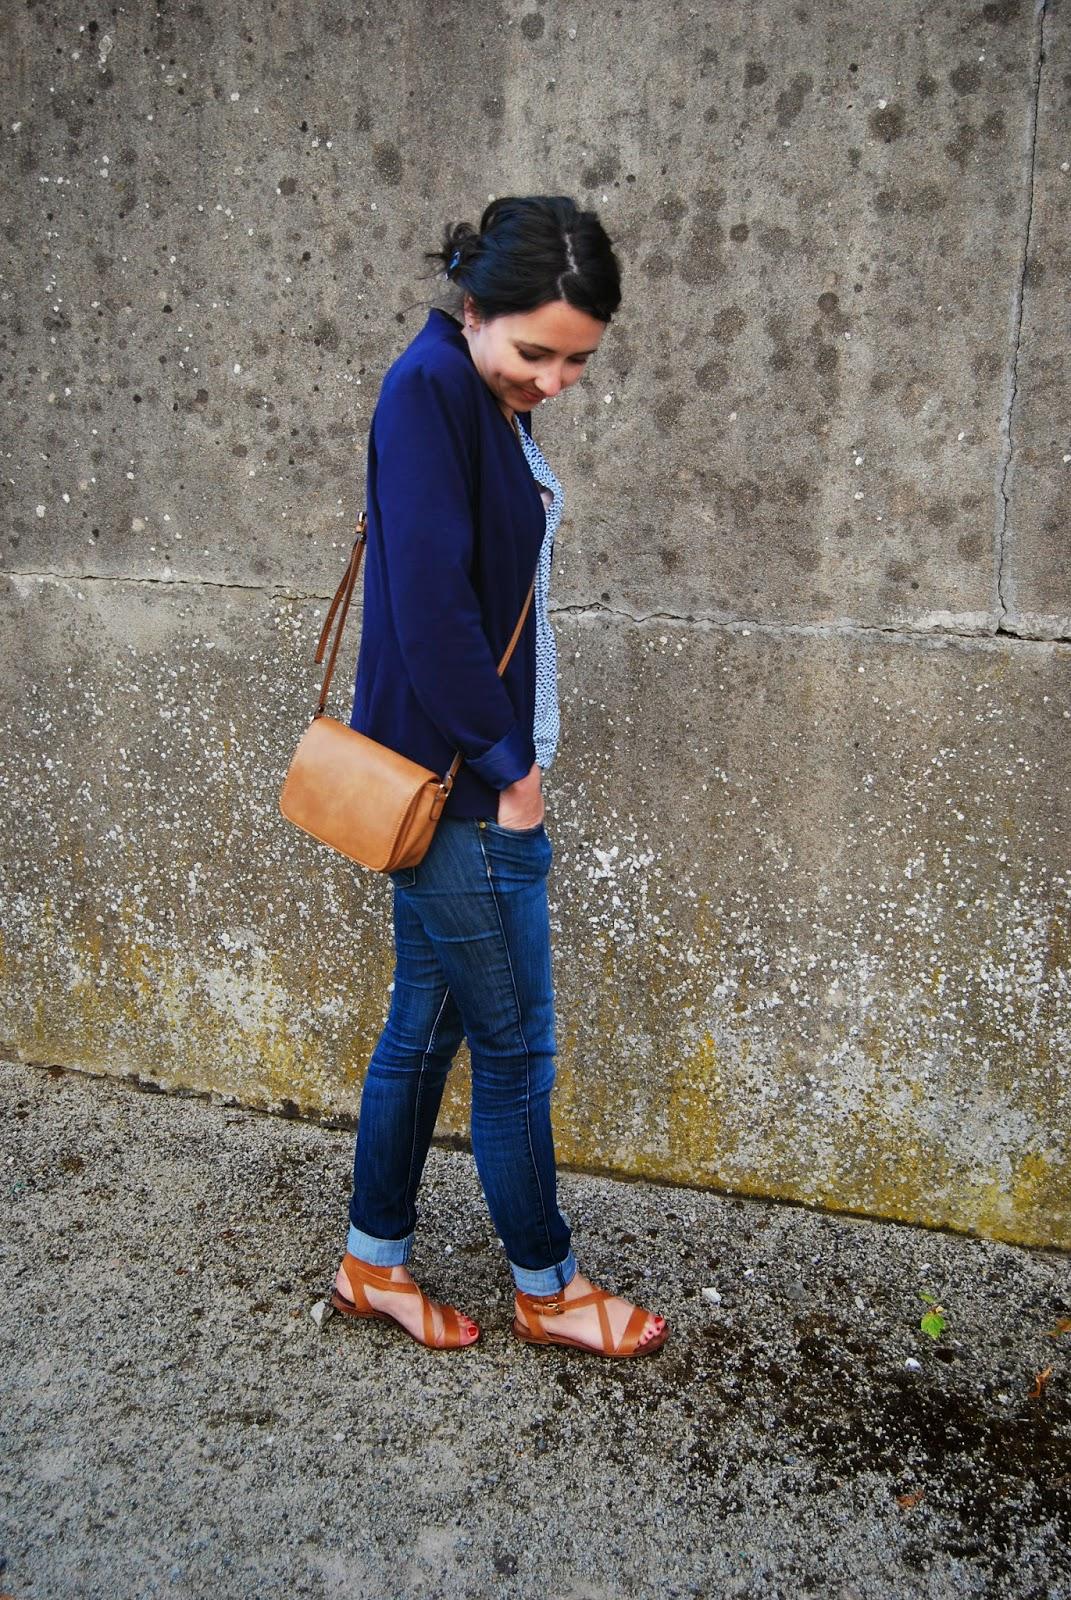 veste bleu camaieu, sac marron monoprix, sandales pull&bear